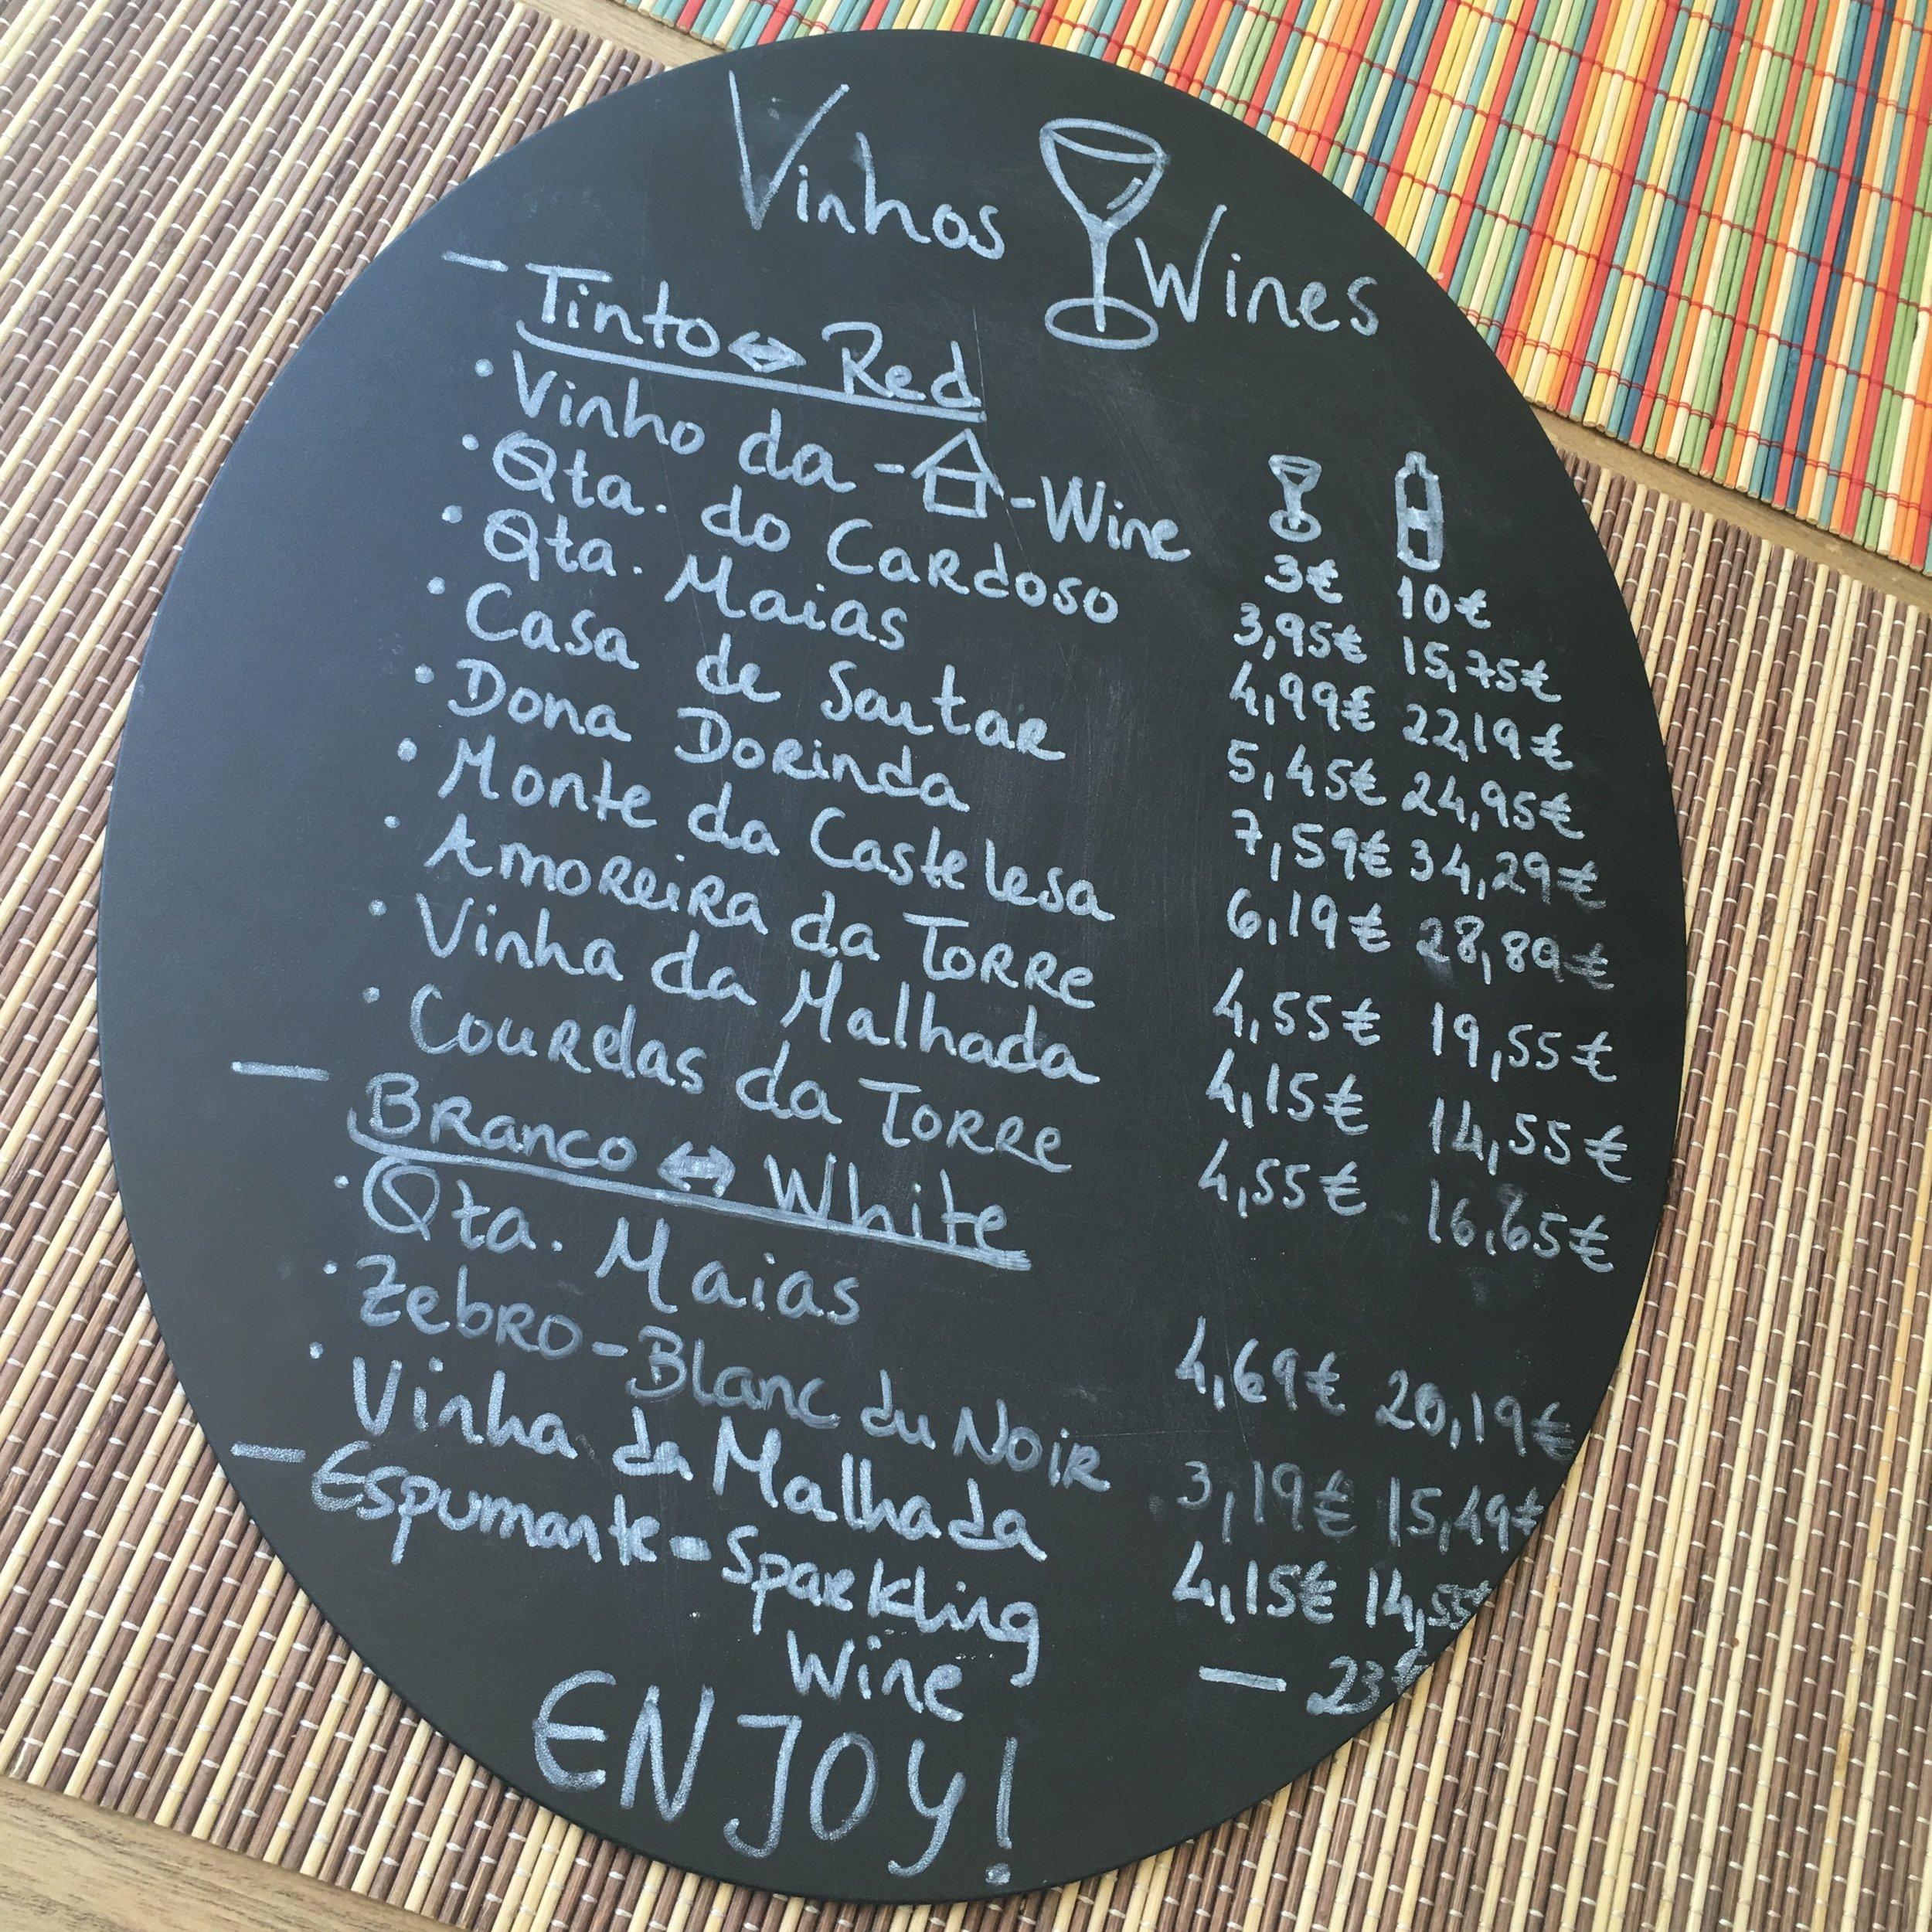 Casa Do mercado - organic restaurant - eco travel - florum fashion magazine - noelle lynne - organic wine vino lisbon portugal